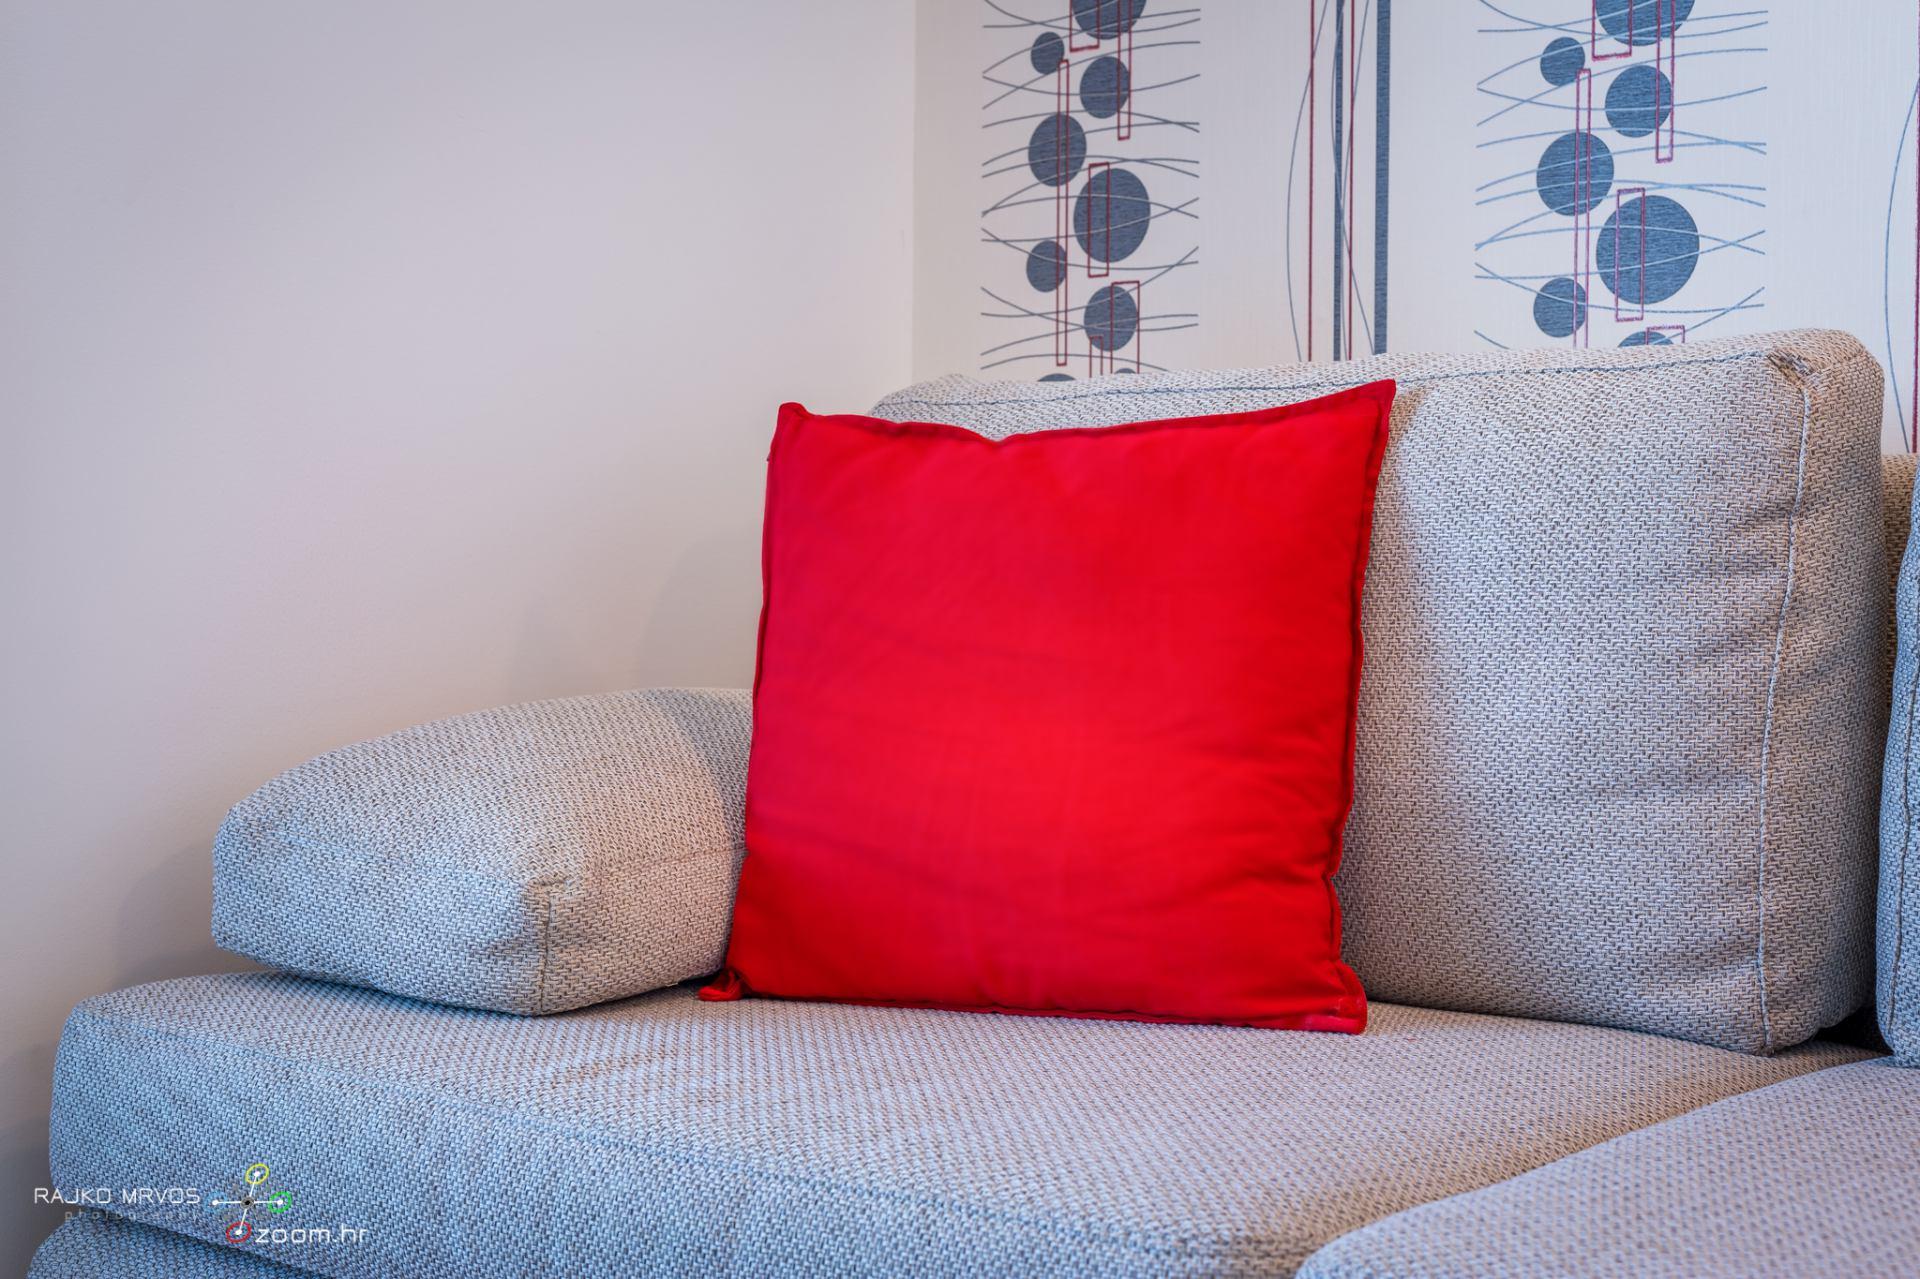 fotografiranje-interijera-fotograf-eksterijera-apartmana-vila-kuca-apartman-Beč-13